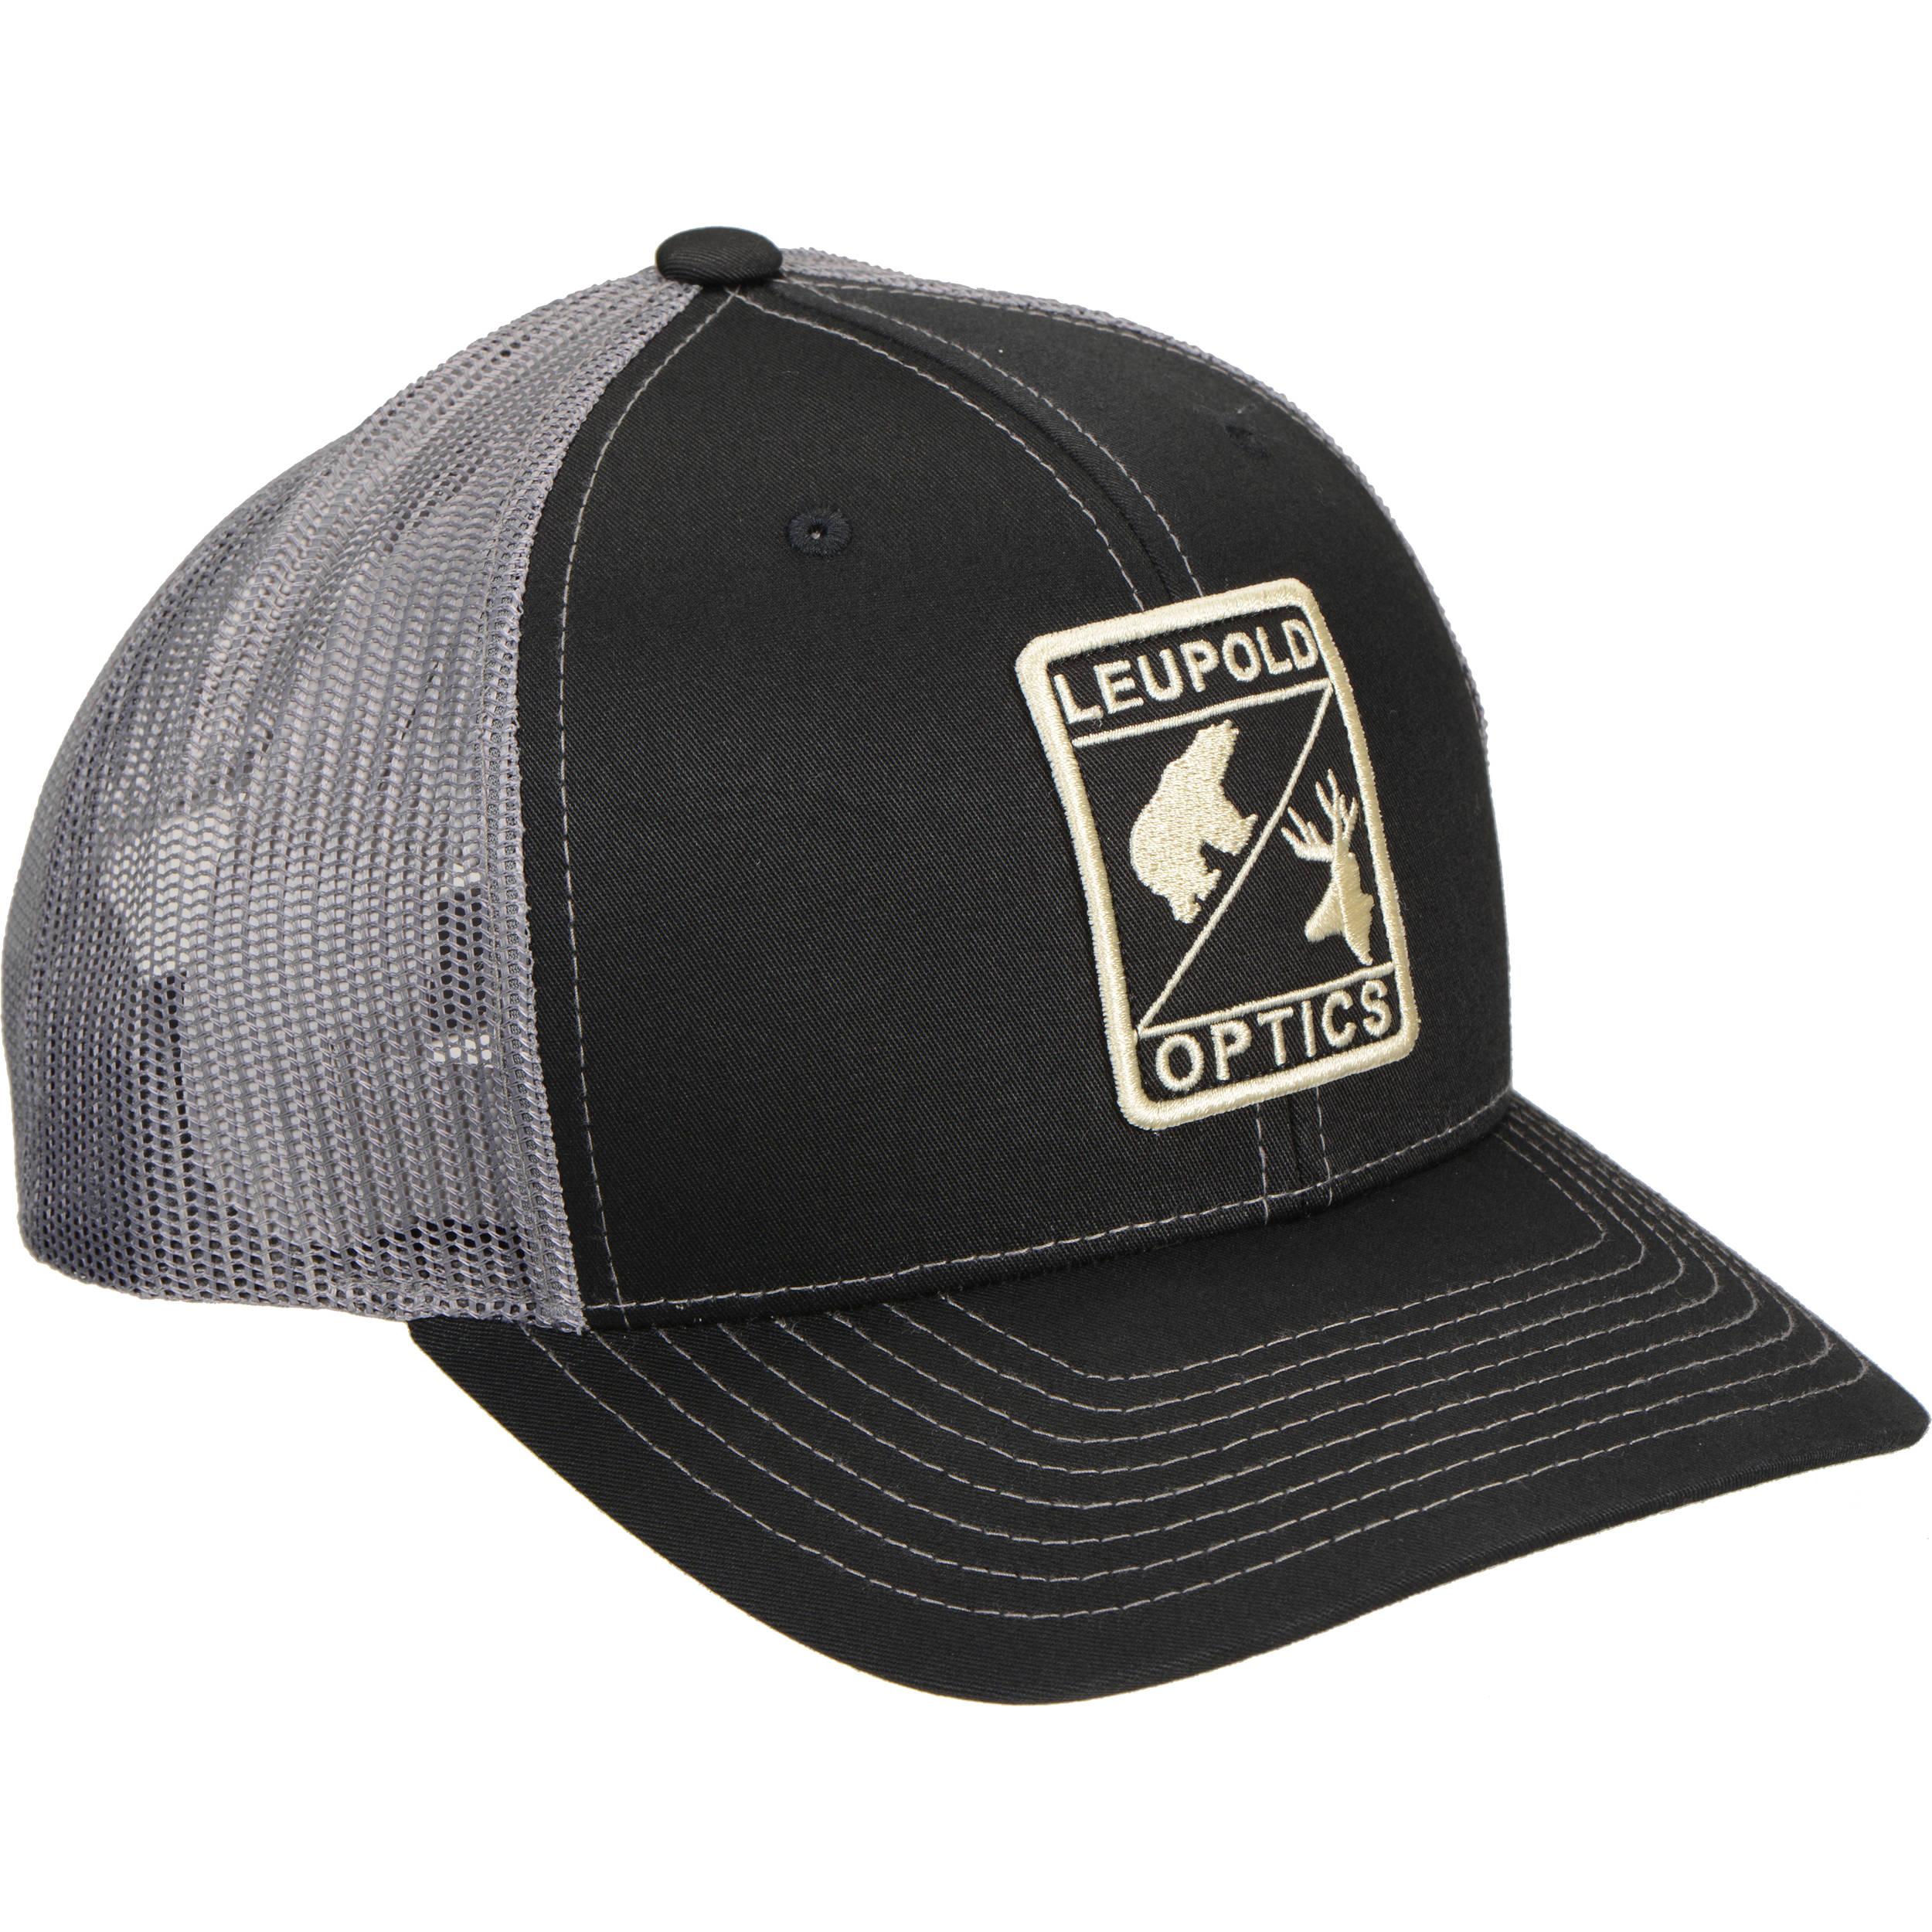 Leupold L Optic Trucker Hat (Black Charcoal 500c2f19134